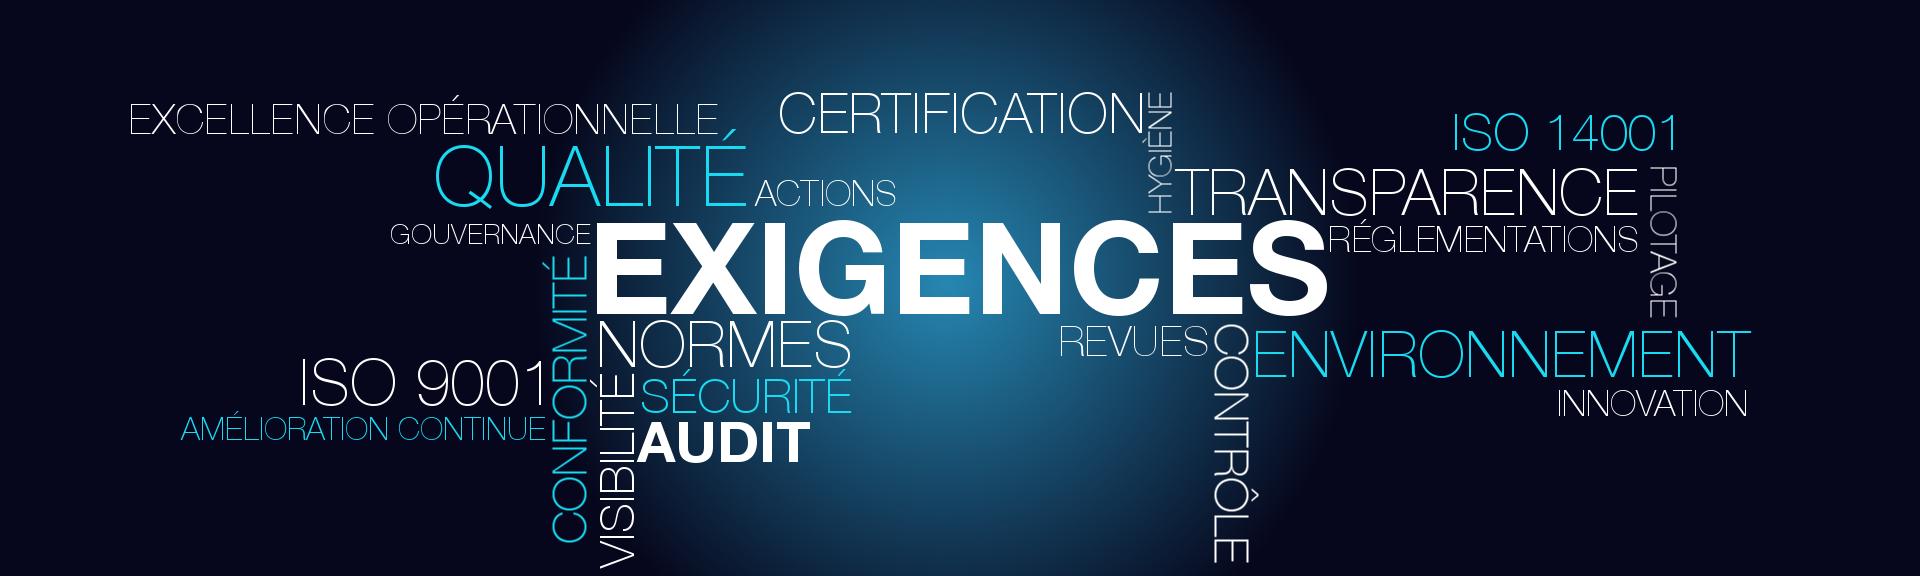 CSR :  Customer Specific Requirements